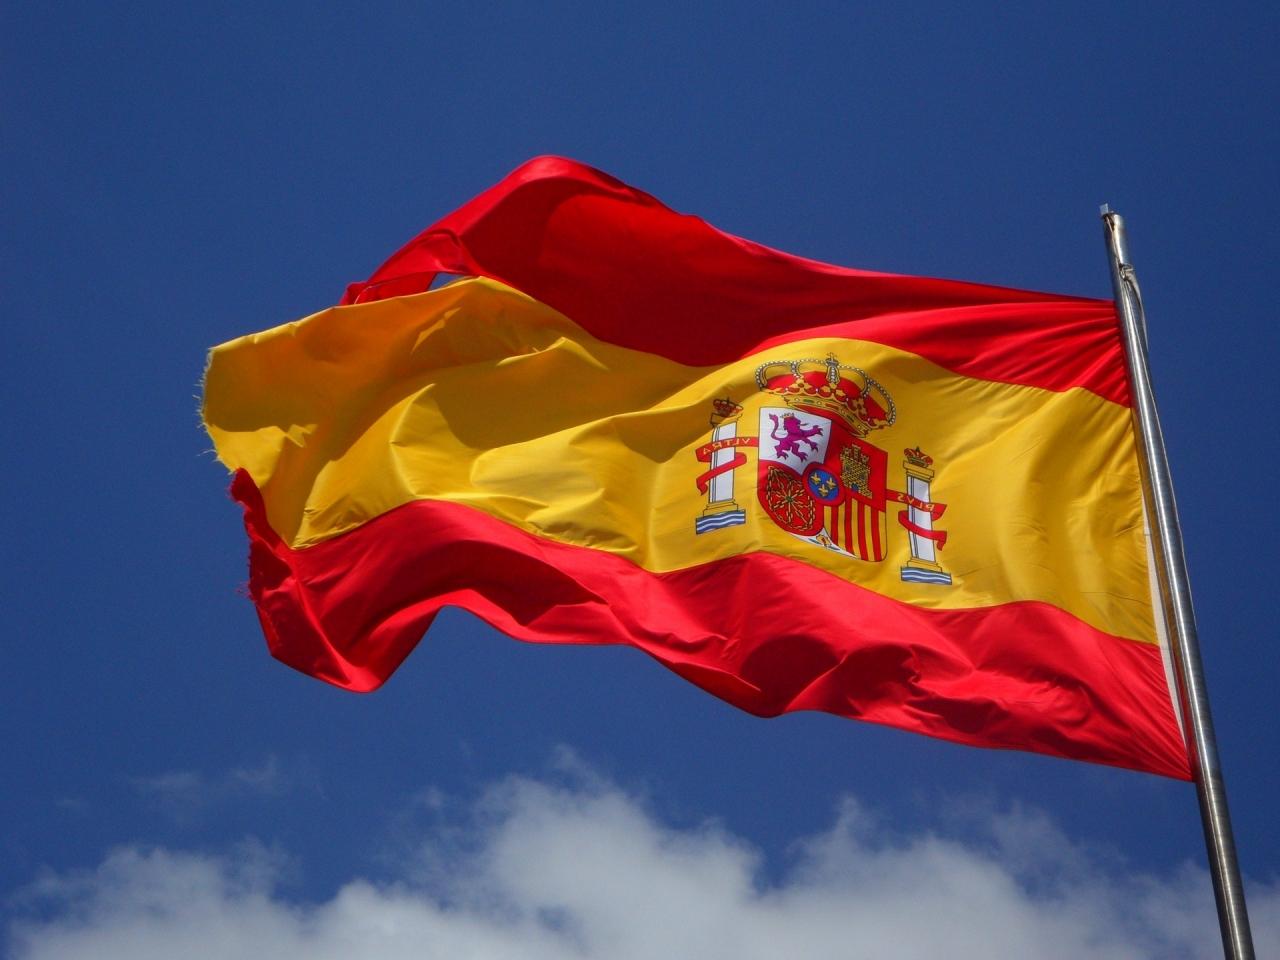 flagpole-spain-spanish-54097